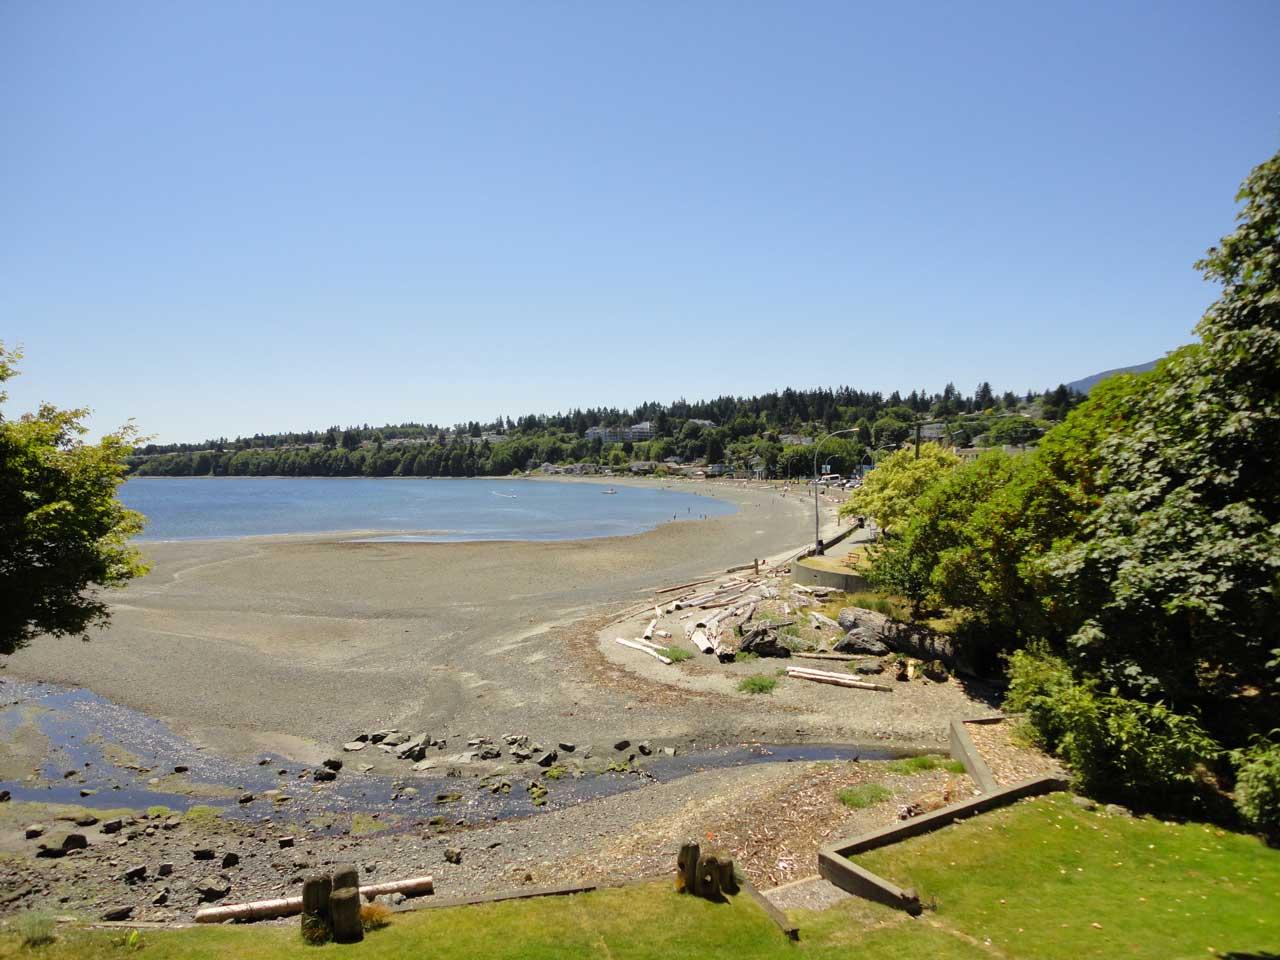 Vancouver Island beach on a sunny day